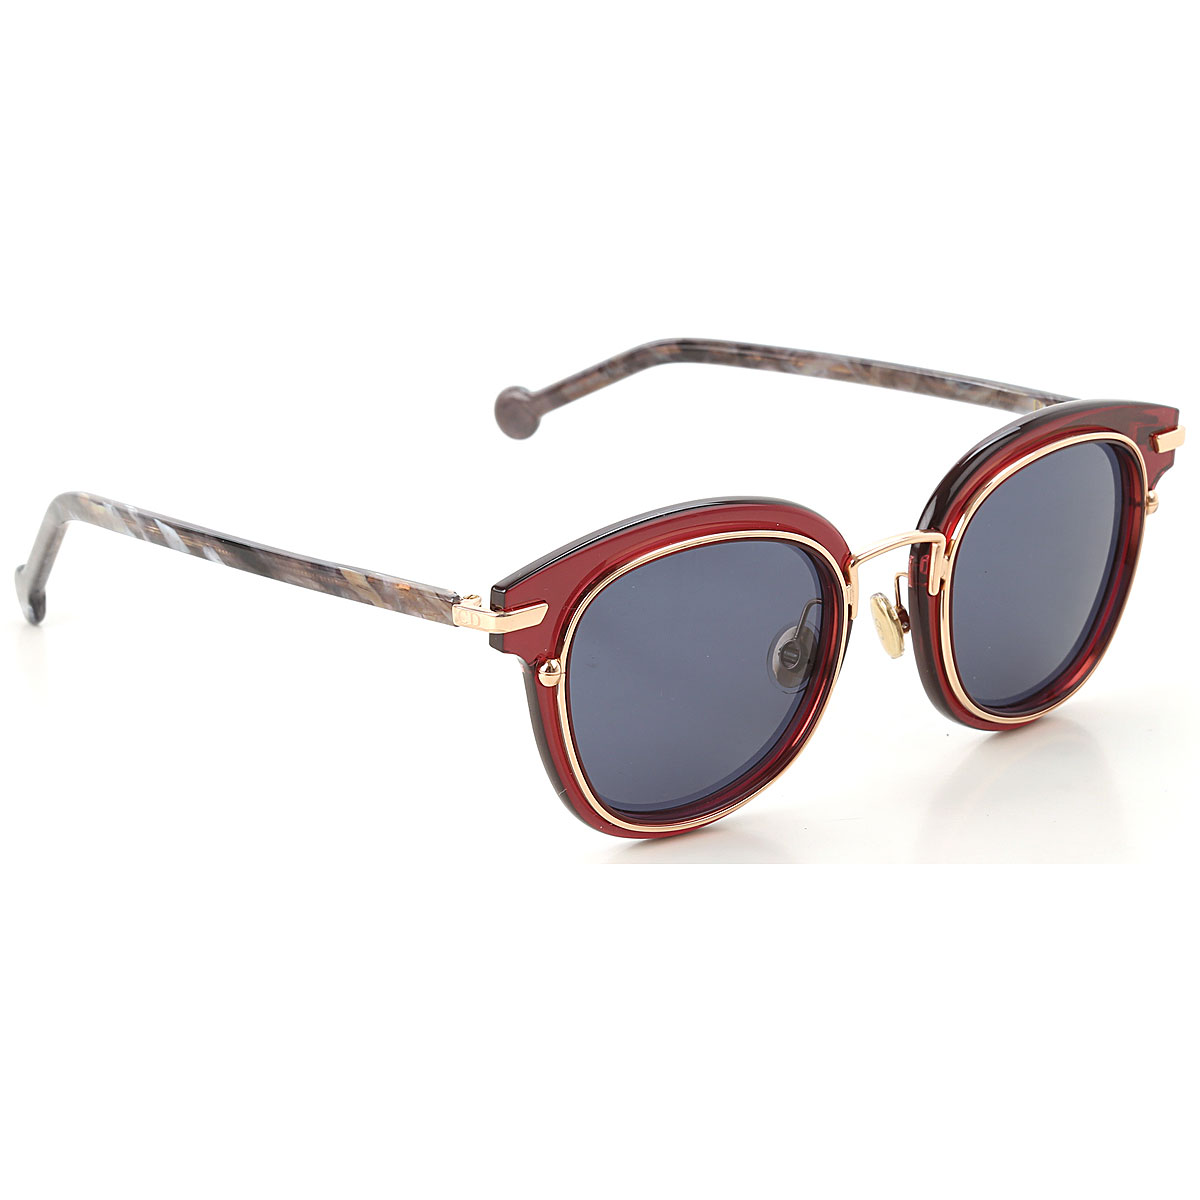 Image of Christian Dior Sunglasses On Sale, Burgundy, 2017